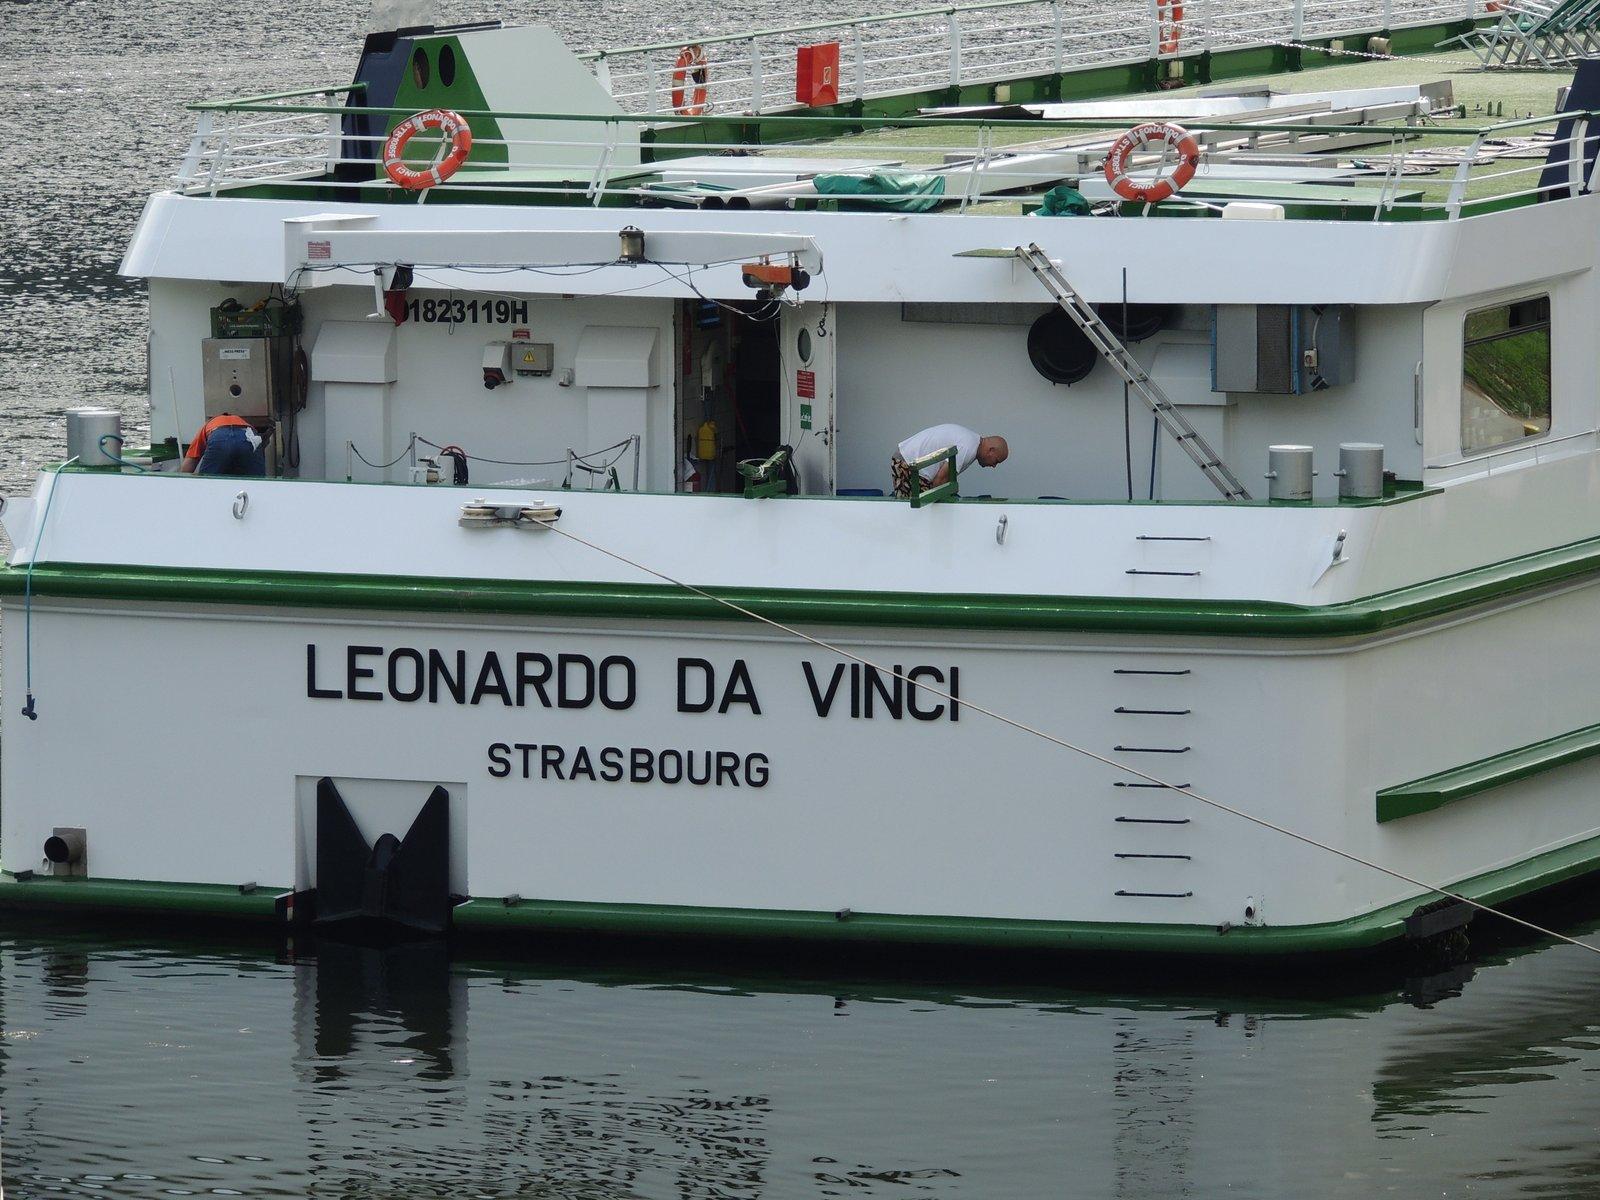 MS Leonardo da Vinci auf dem Rhein